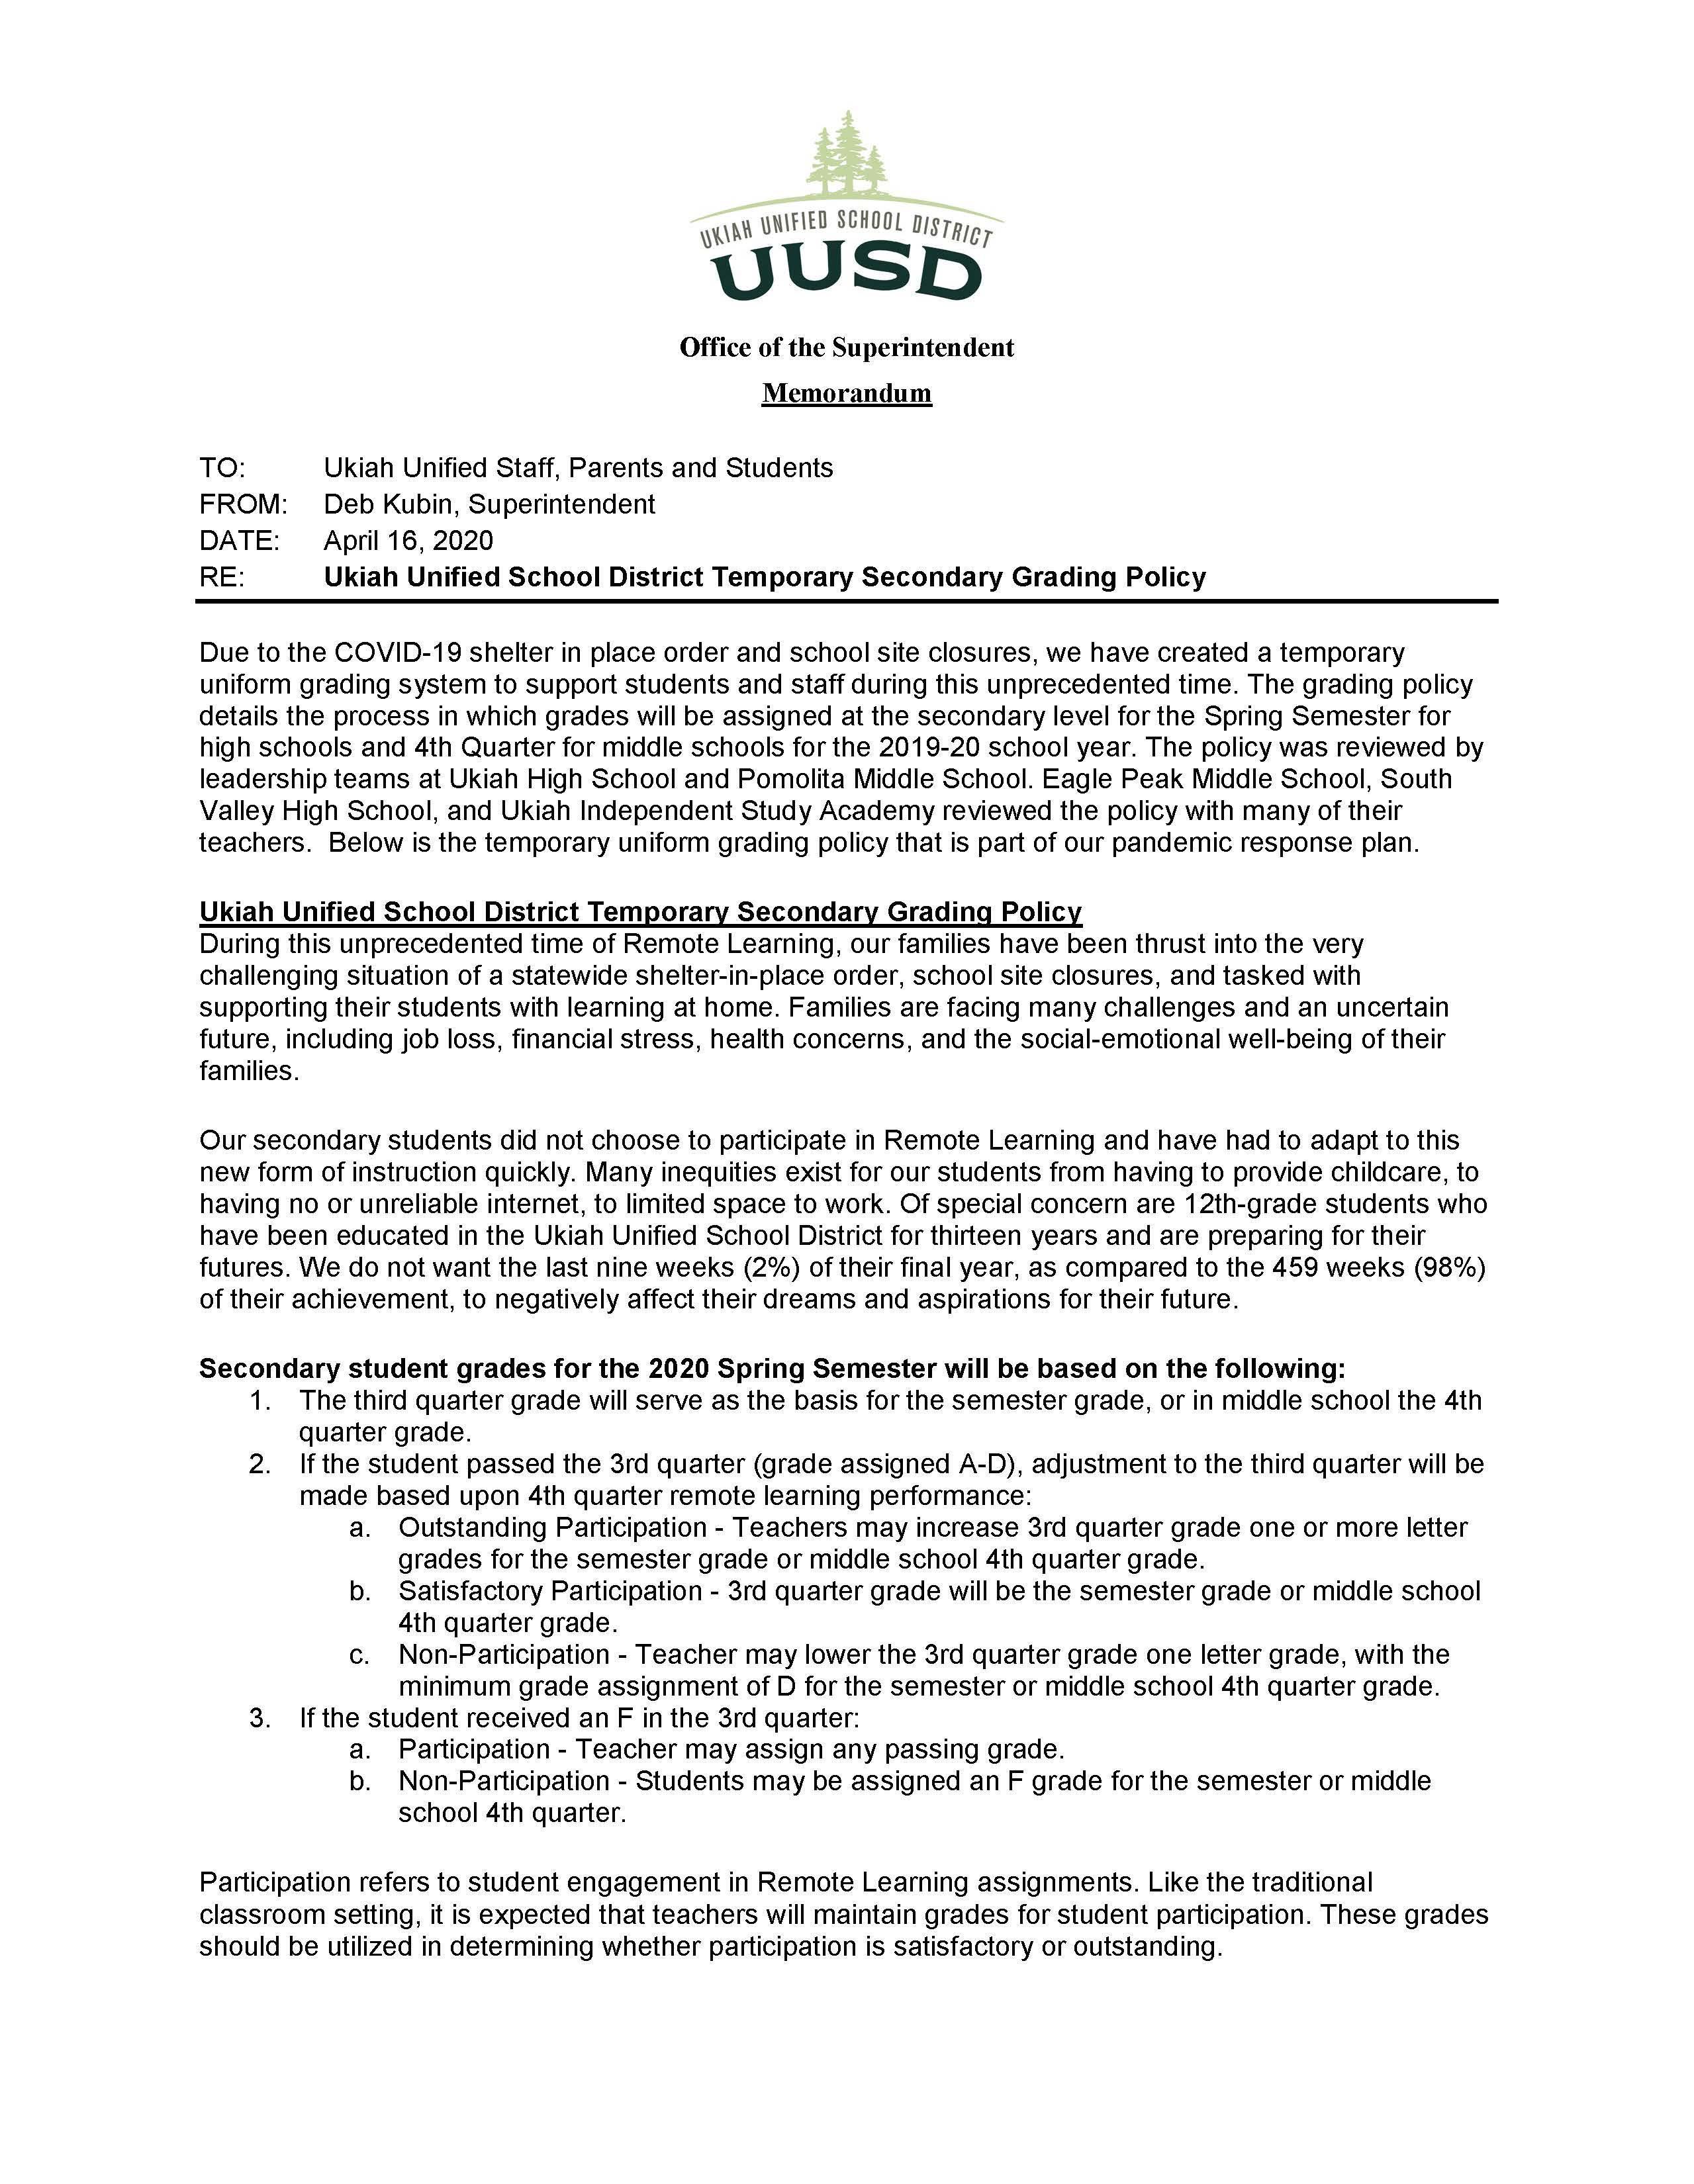 Temporary Grading Policy